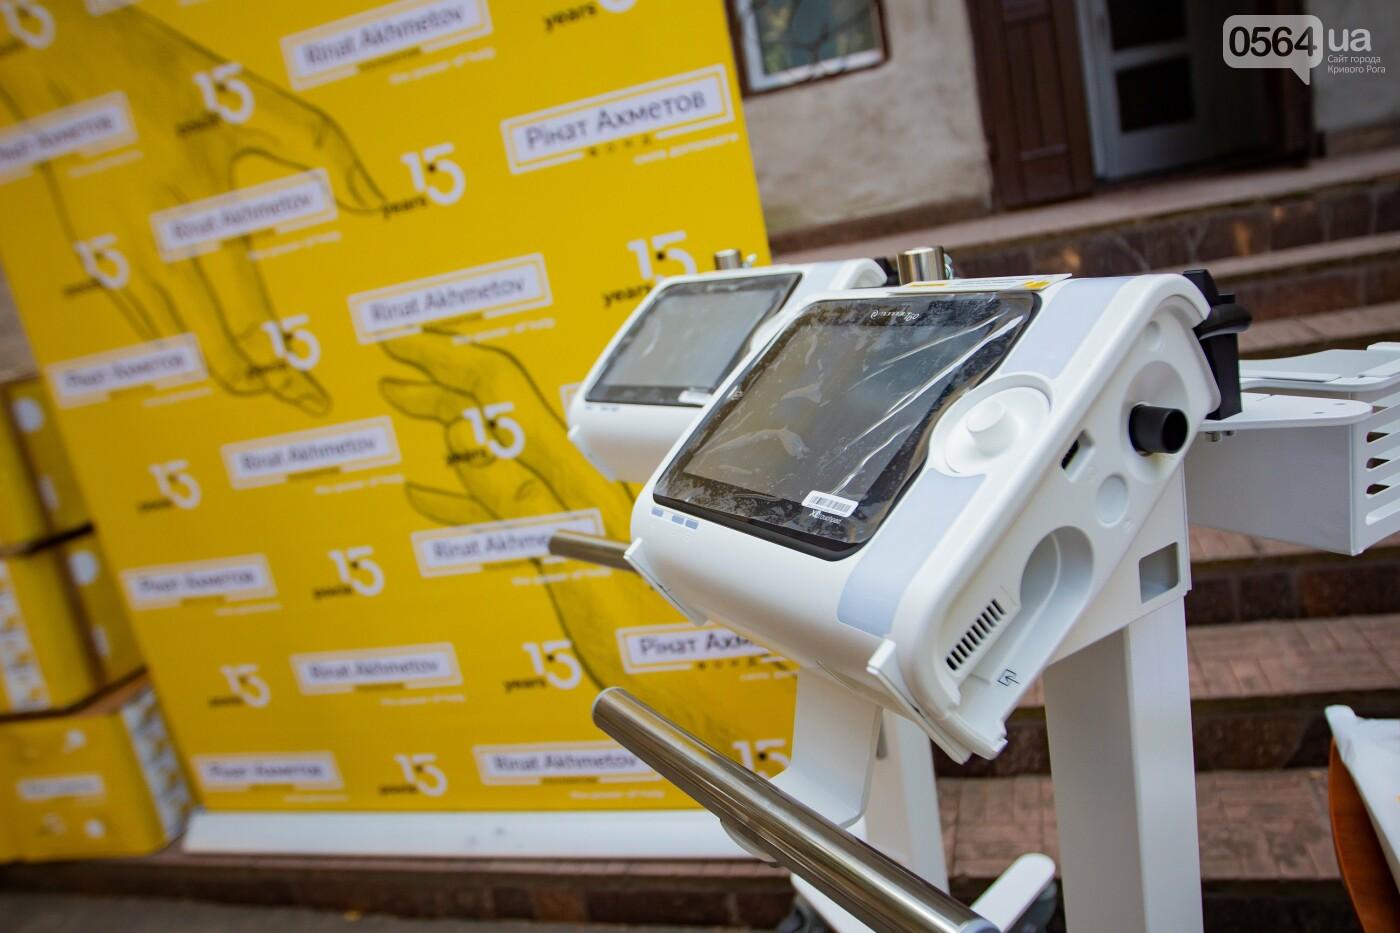 Фонд Рината Ахметова передал 3 аппарата ИВЛ больнице Кривого Рога, фото-3